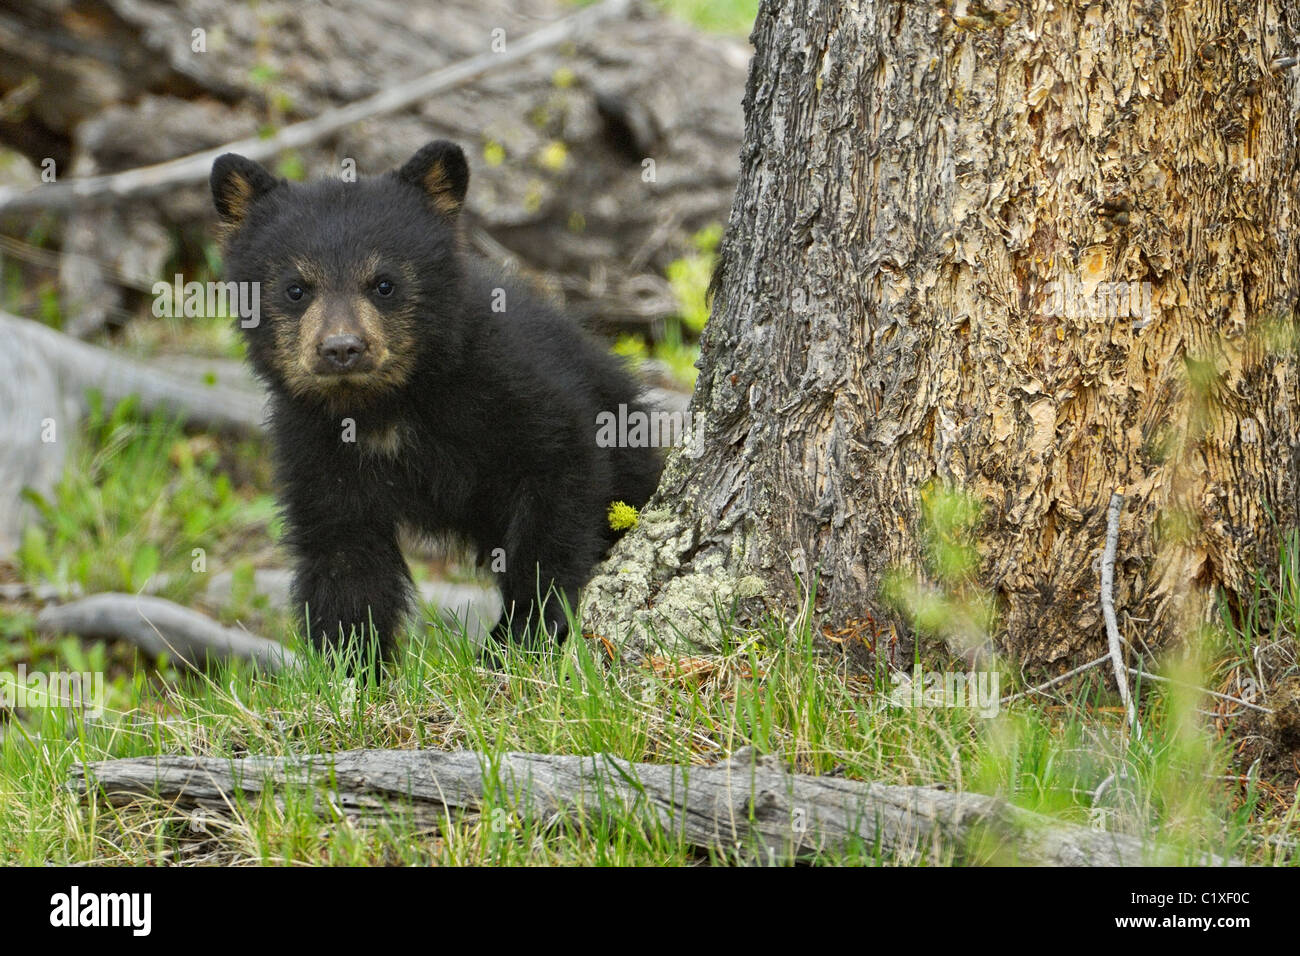 Baby-Schwarzbär Stockbild